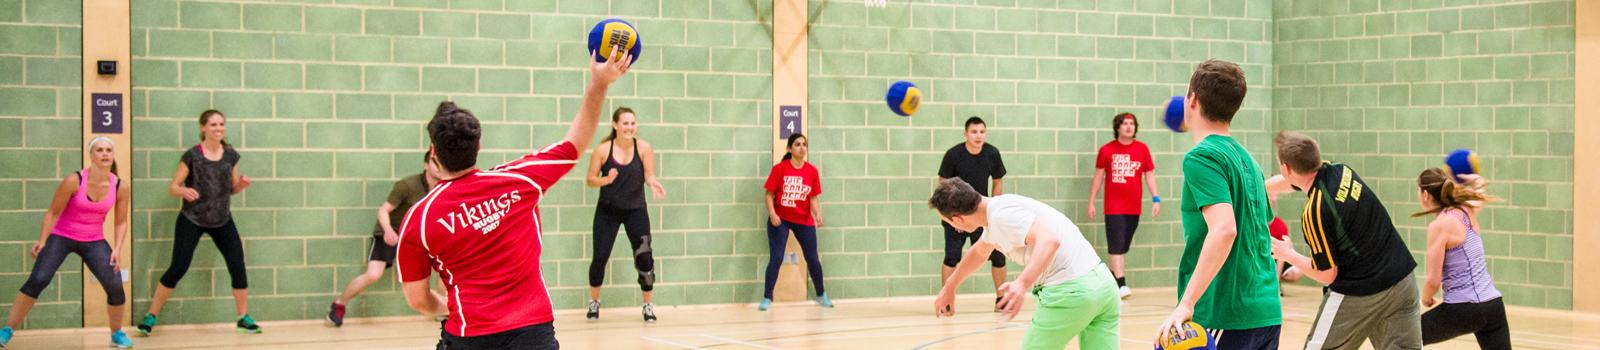 dodgeball london leagues